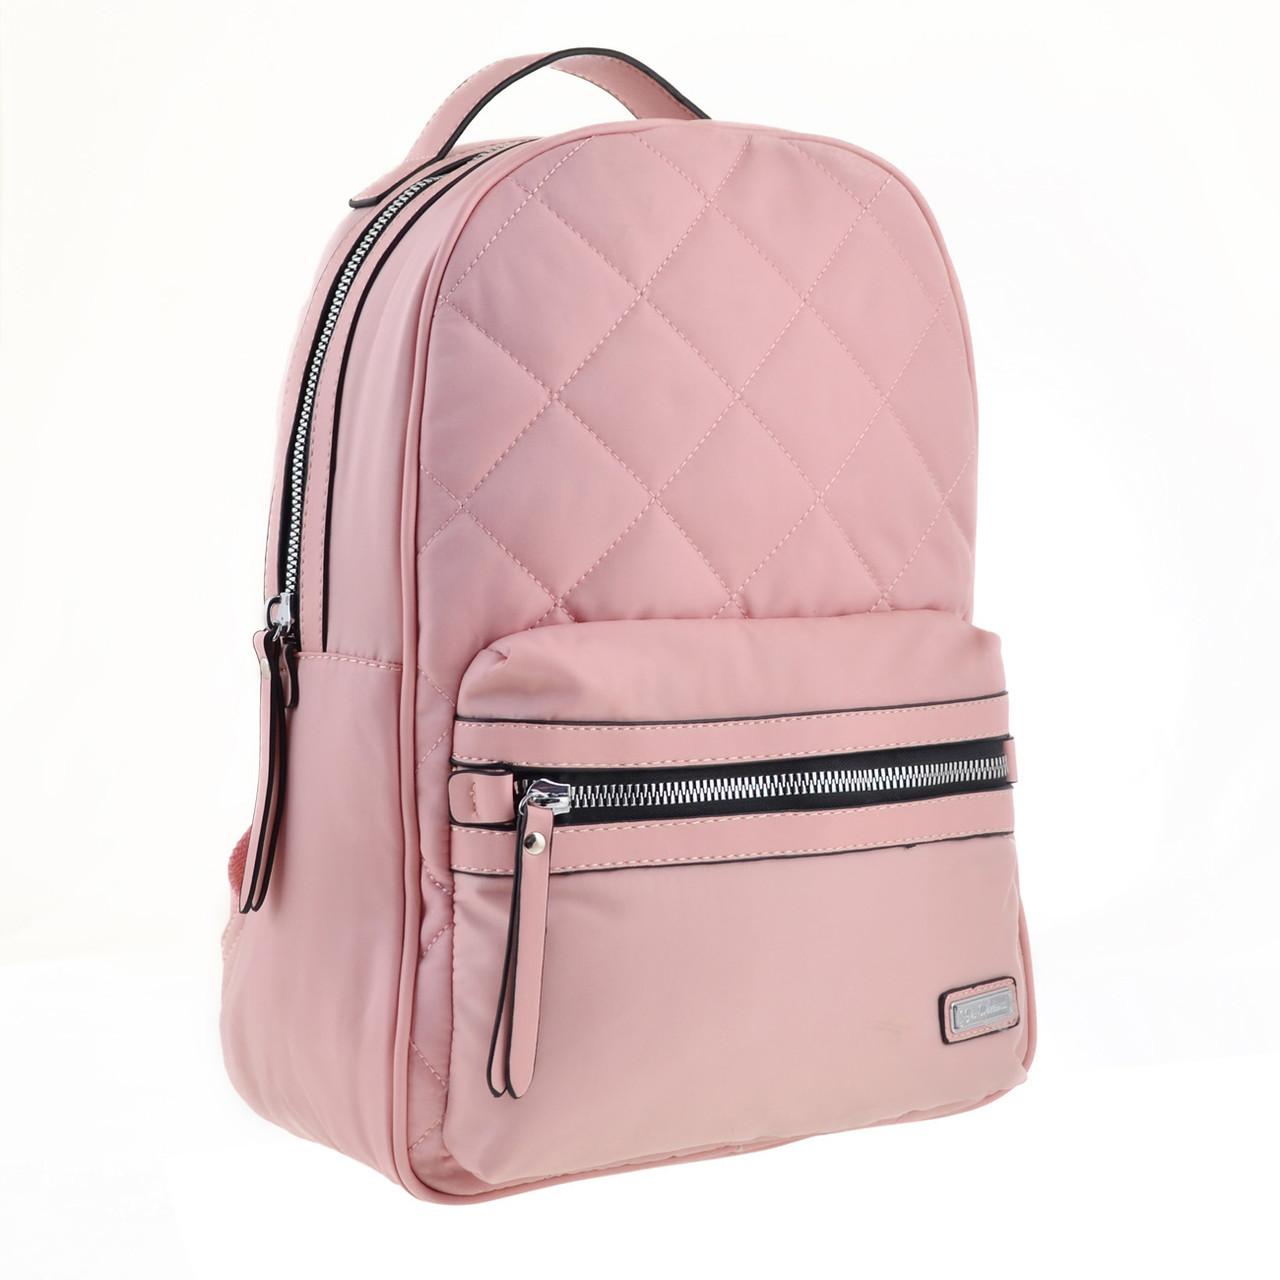 Рюкзак женский YES YW-45 «Tutti» пудровый